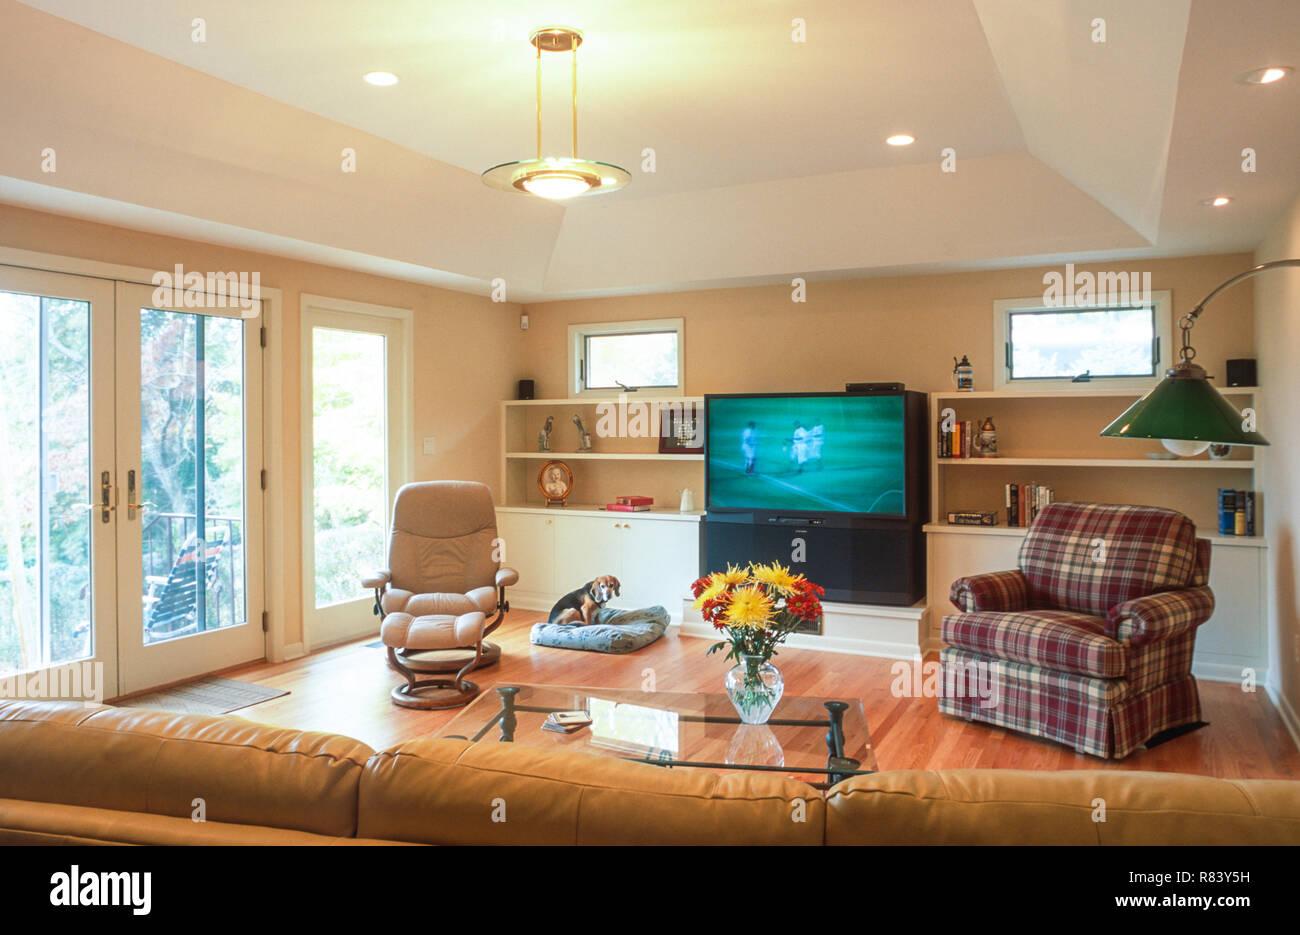 Livingroom Interior, USA - Stock Image